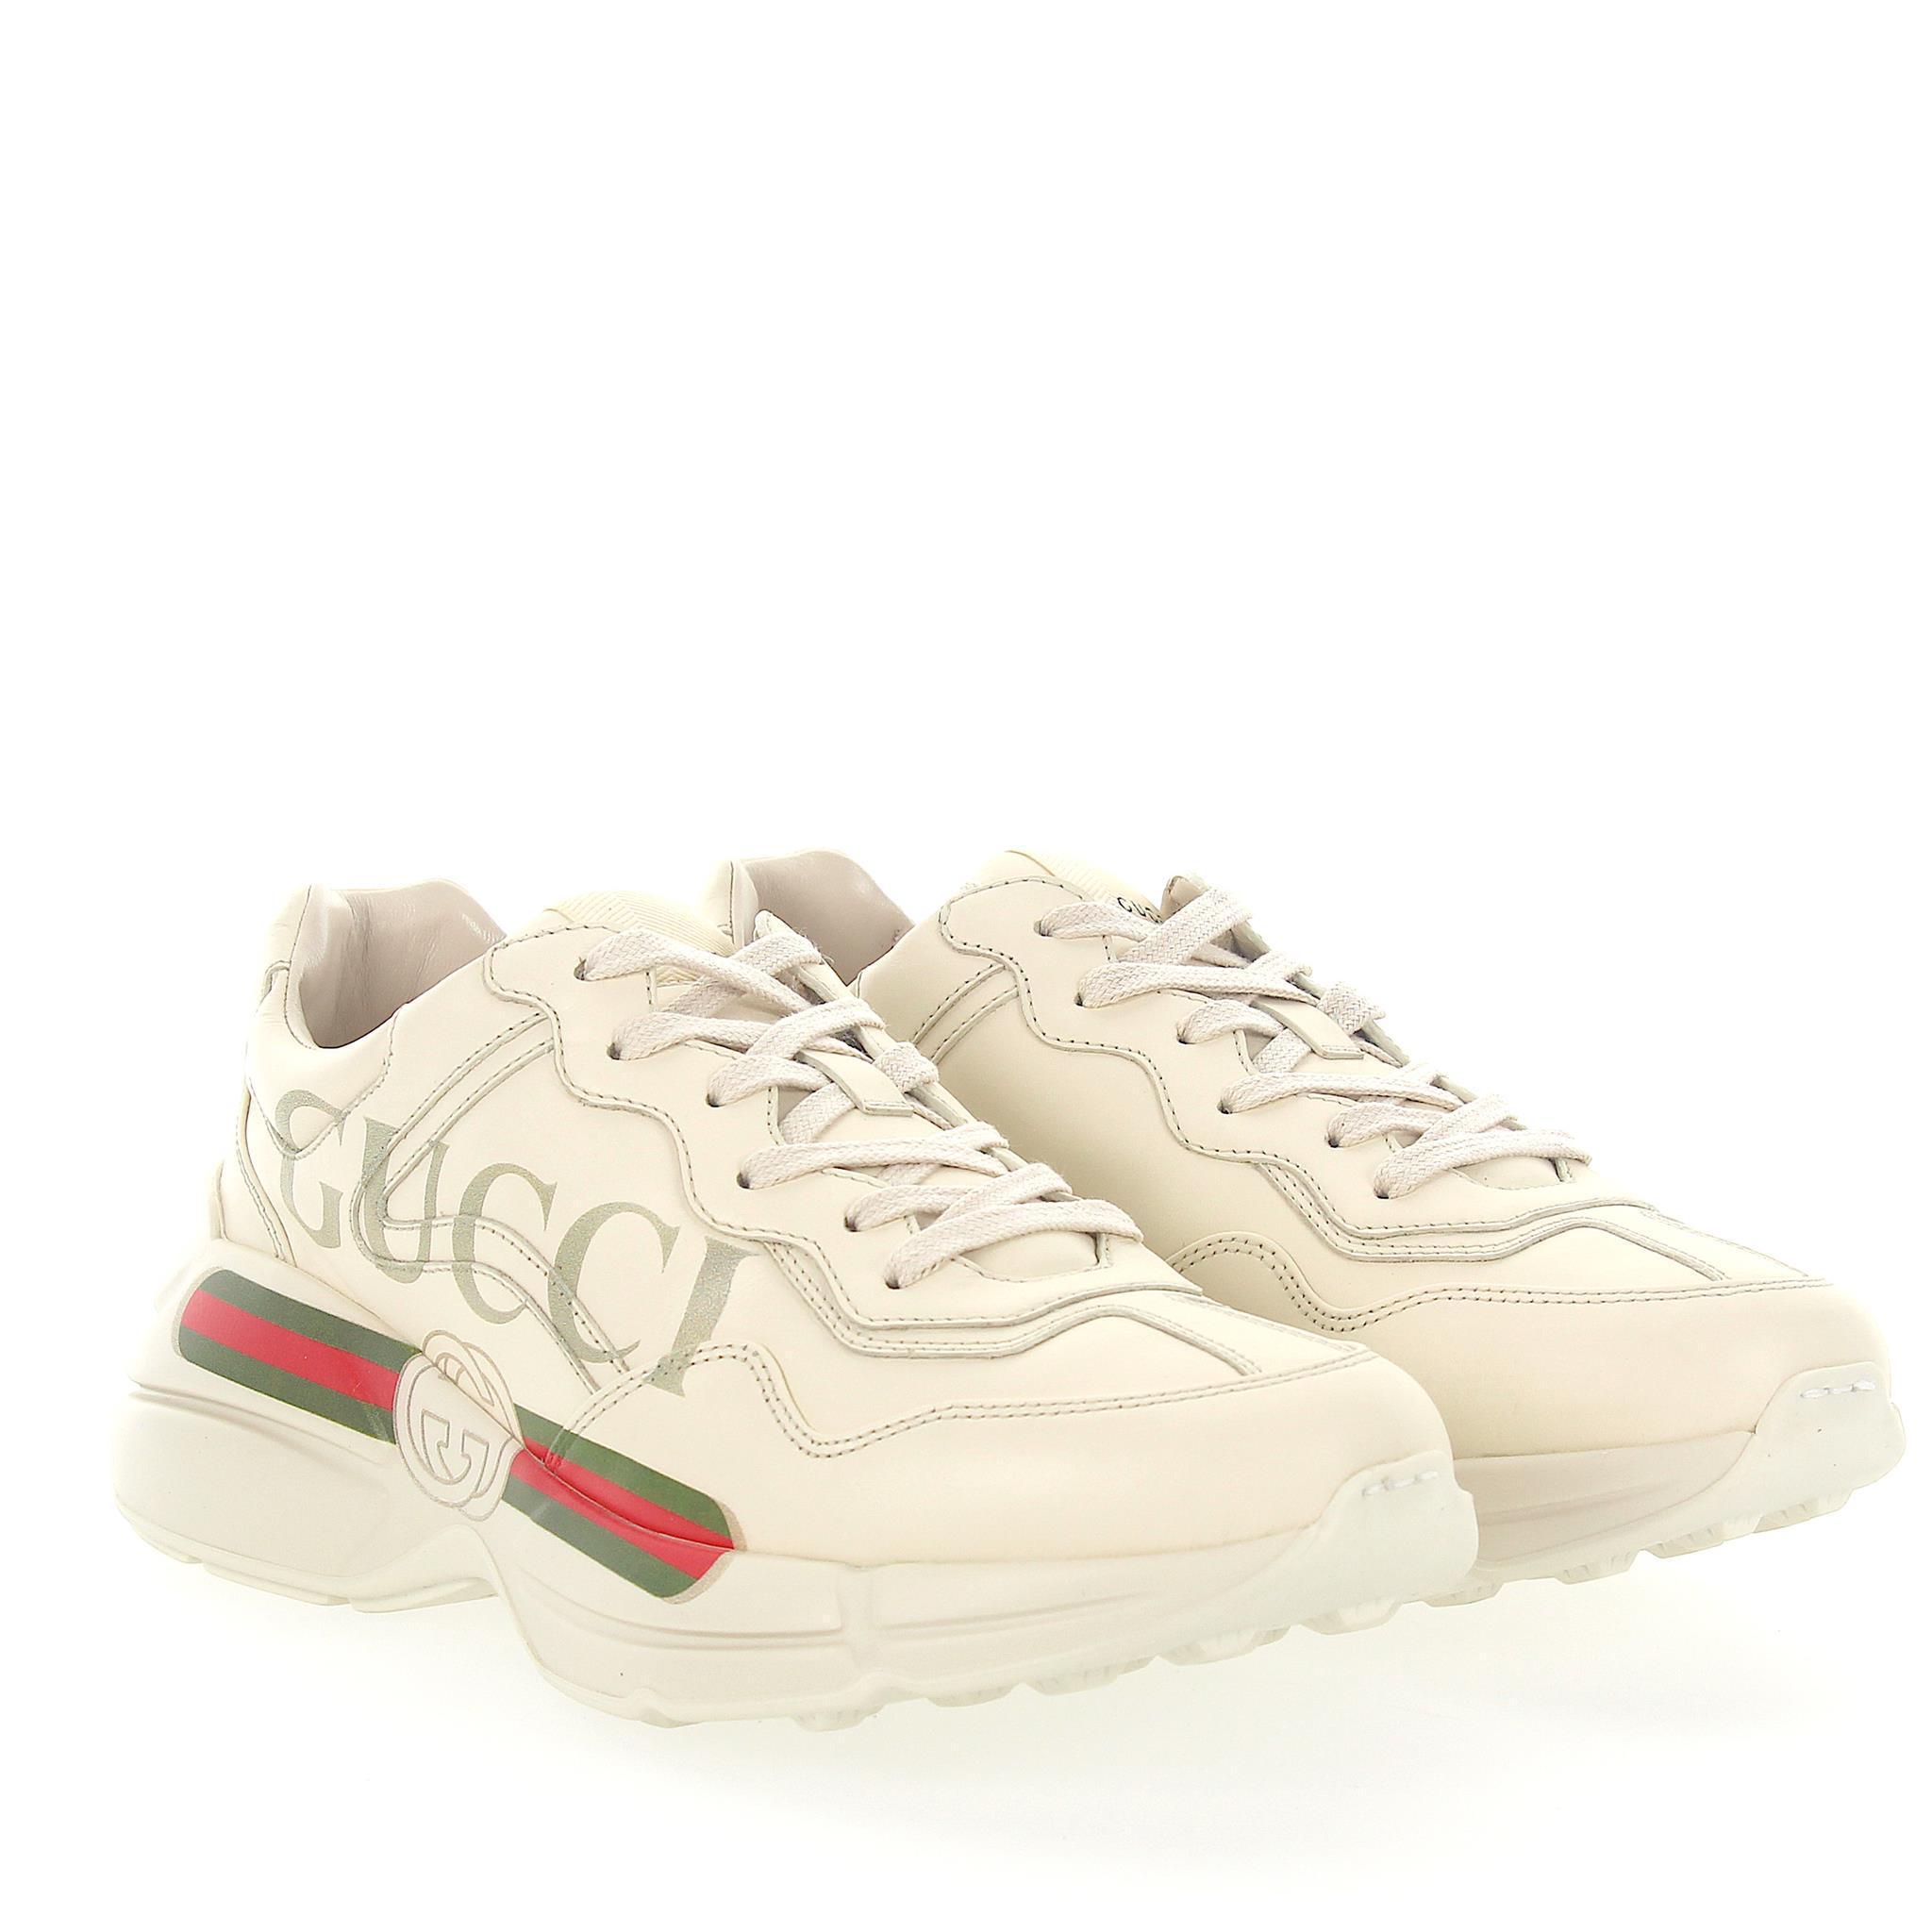 WfV1RNhpb6 Sneaker Rython 500877 leather ivory GG-details jLDd8d9nQ